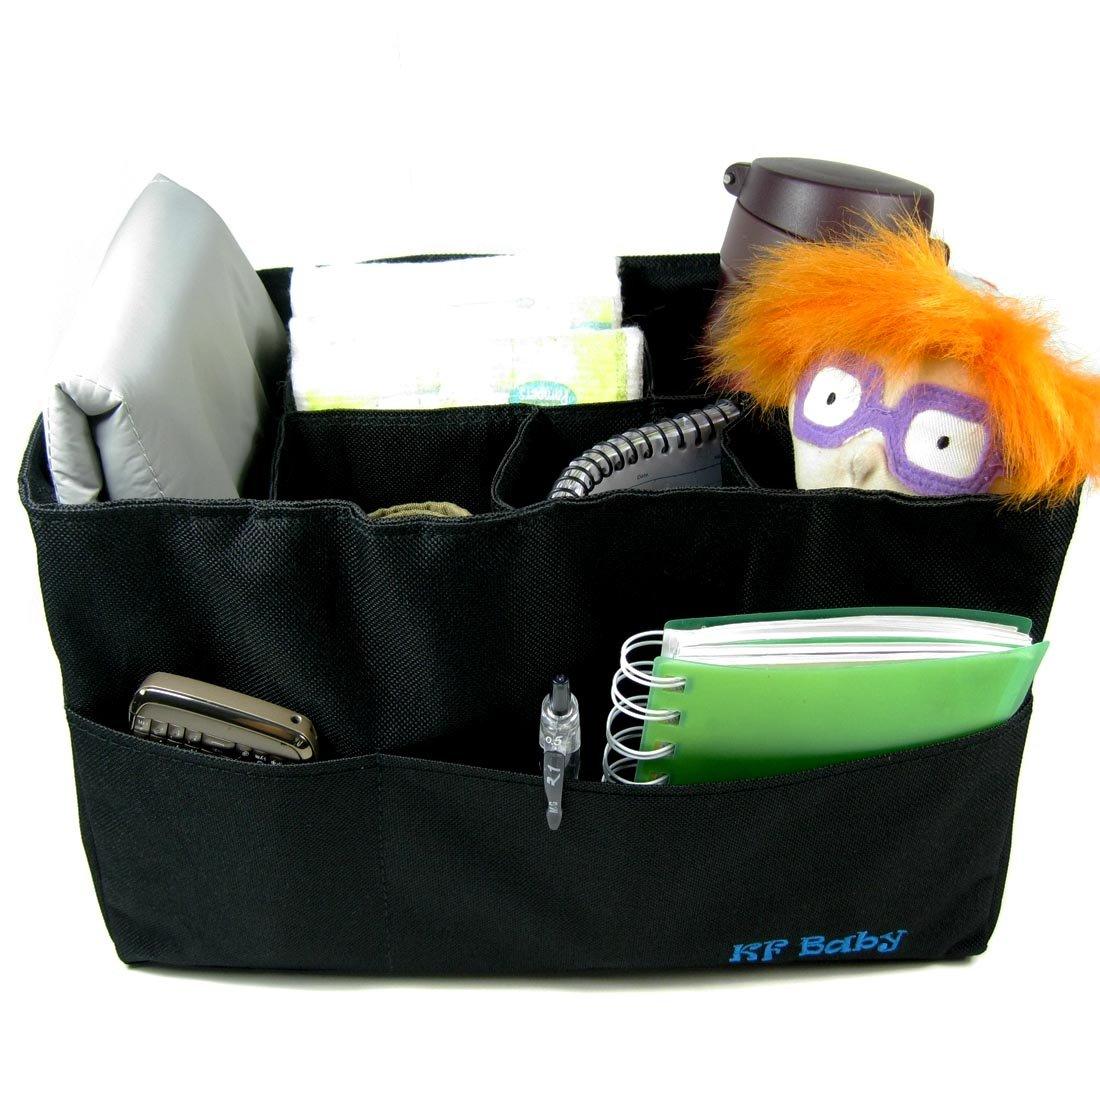 Diaper Changing Pad Value Combo KF Baby Diaper Bag Insert Organizer 12 x 6.4 x 8 inch, Black